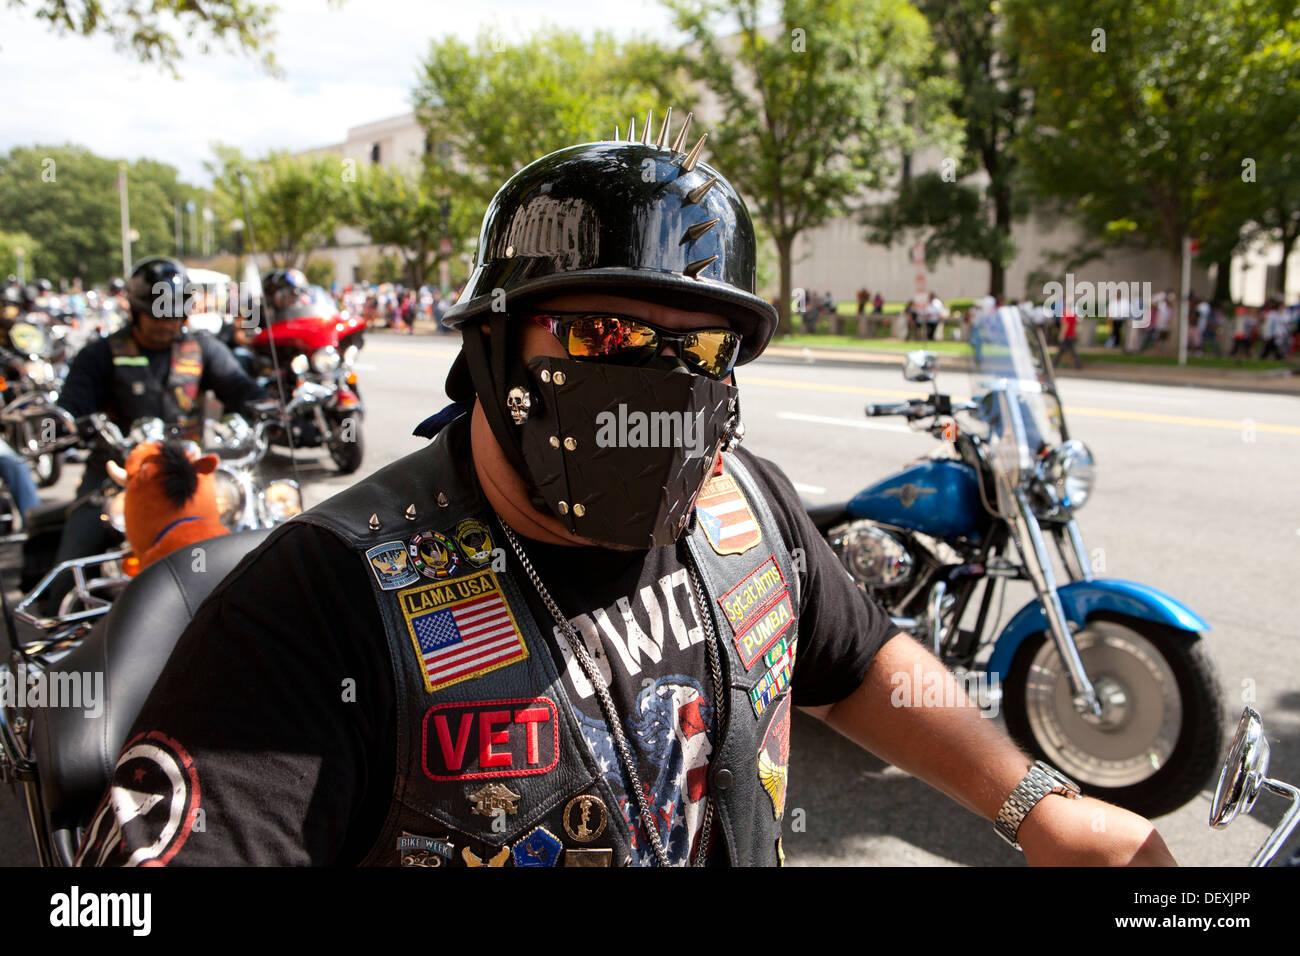 Harley Davidson motorcycle rider wearing leather mask - Stock Image